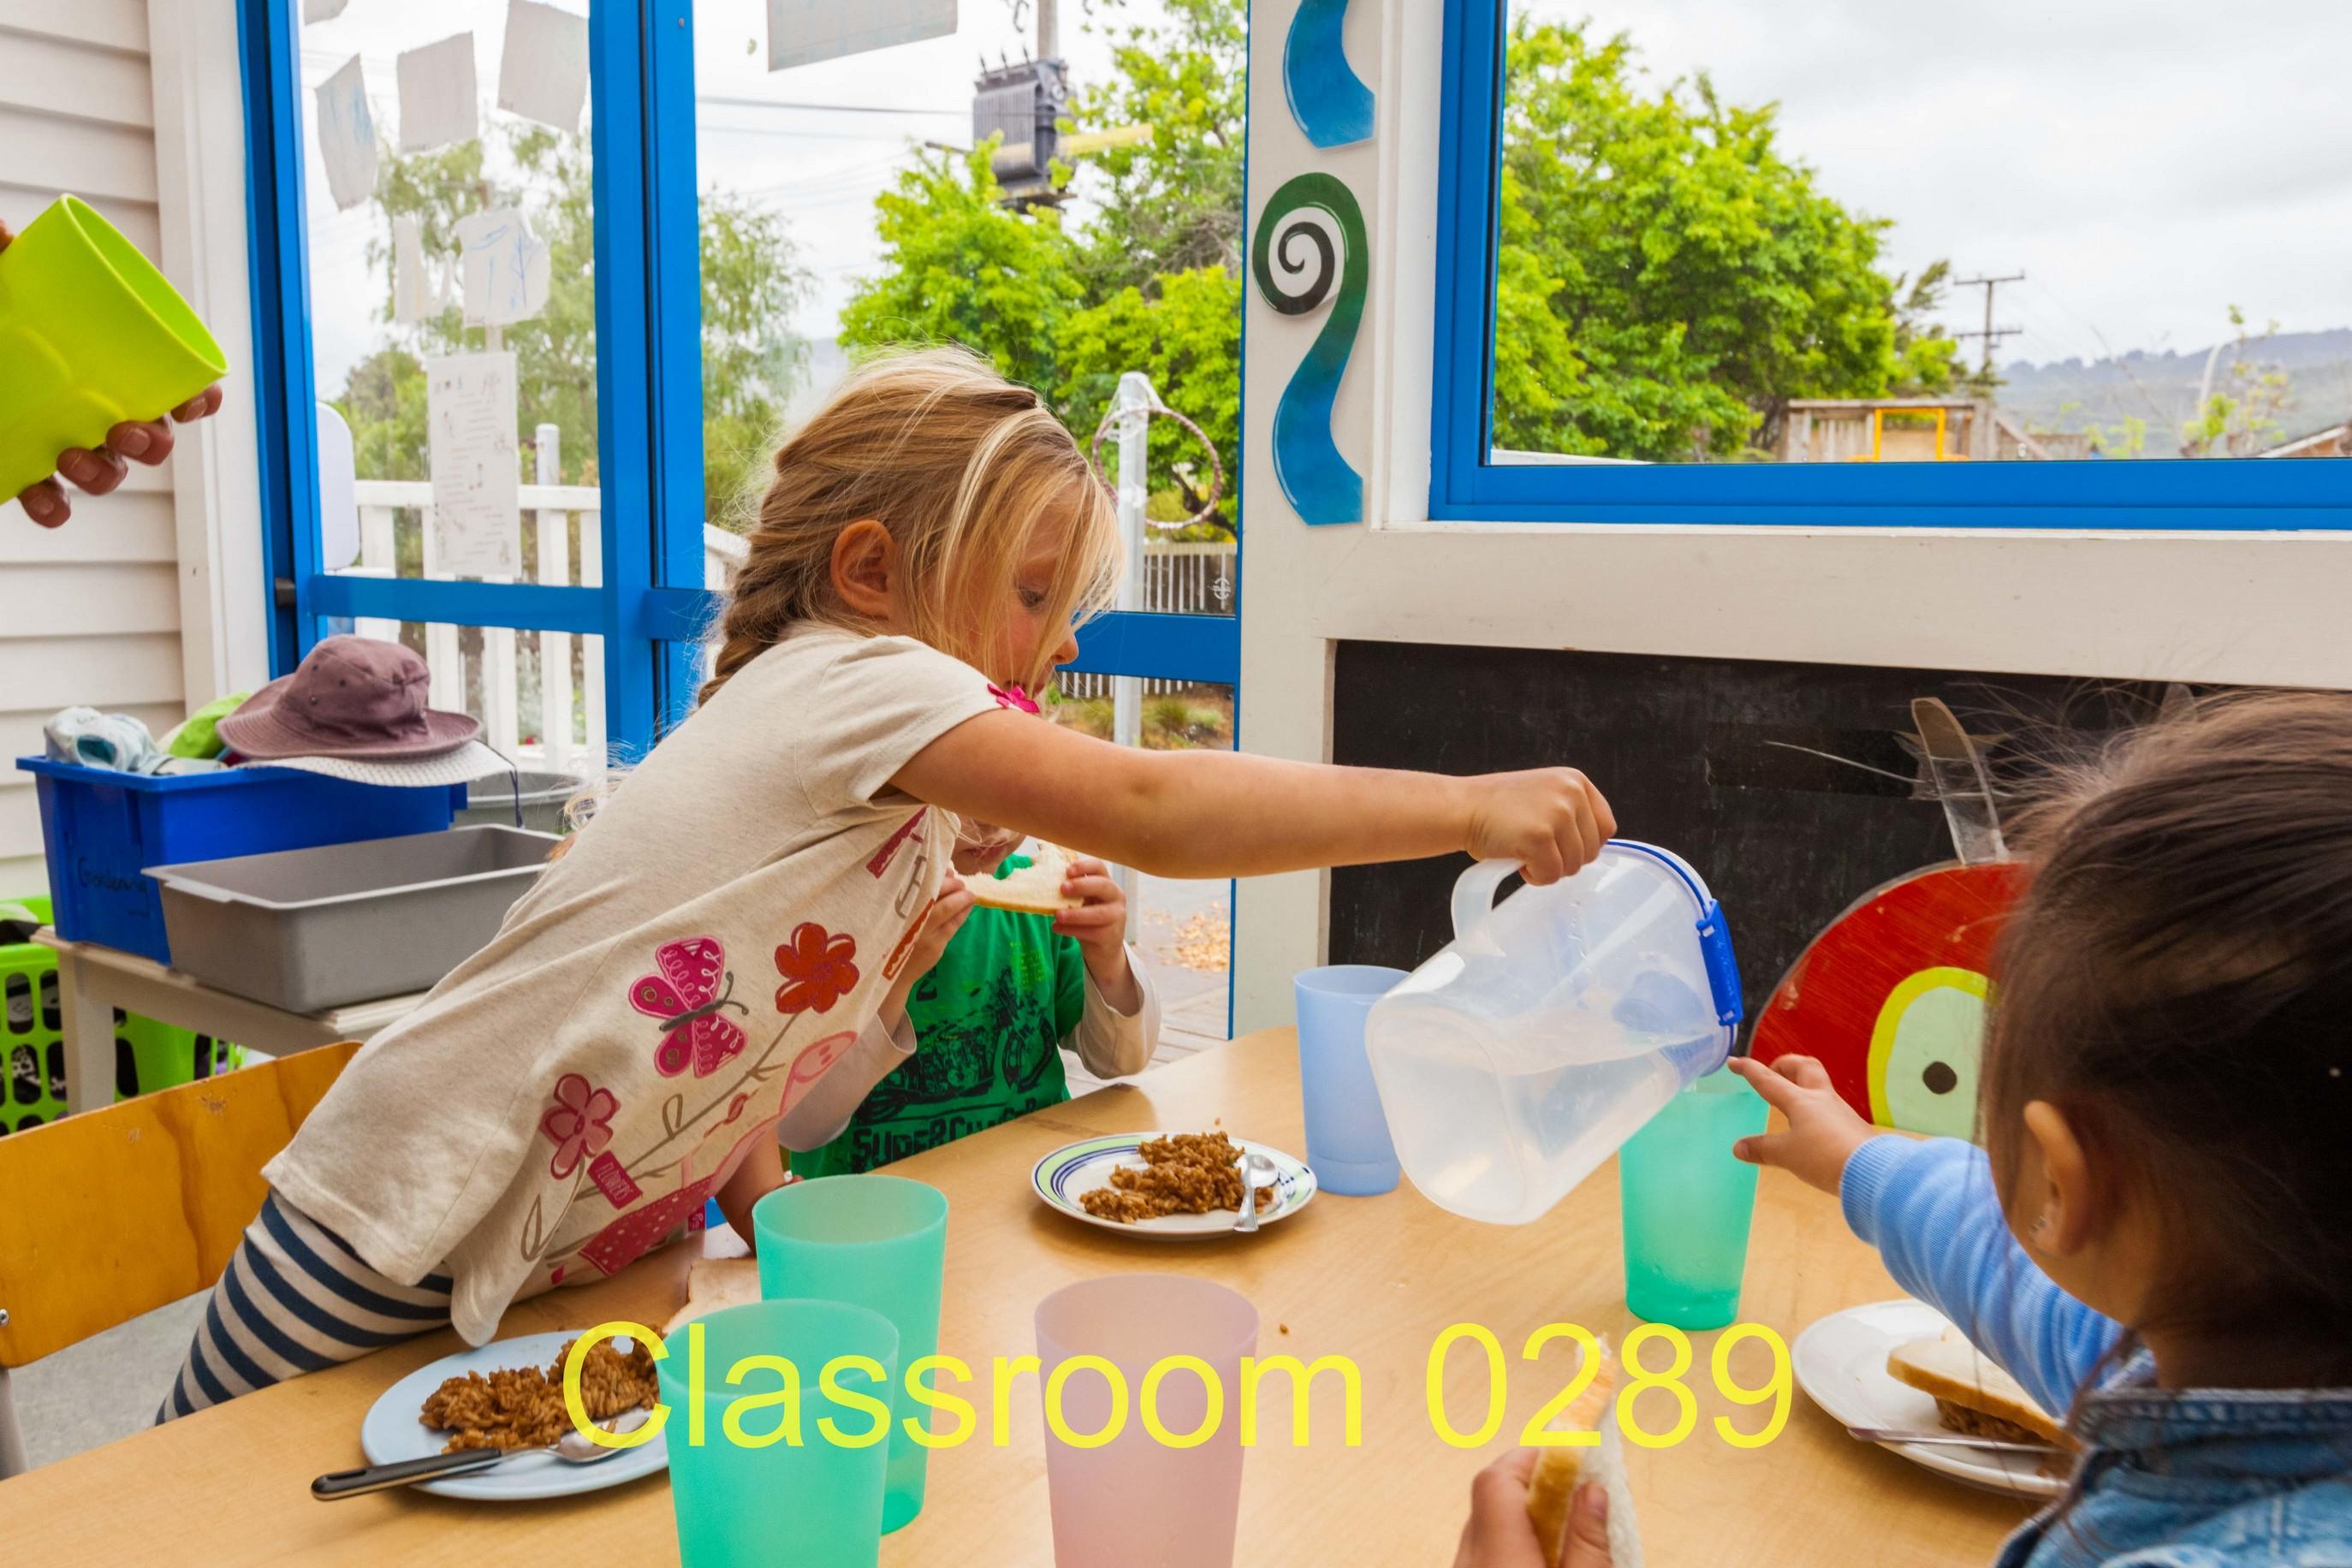 Classroom 0289